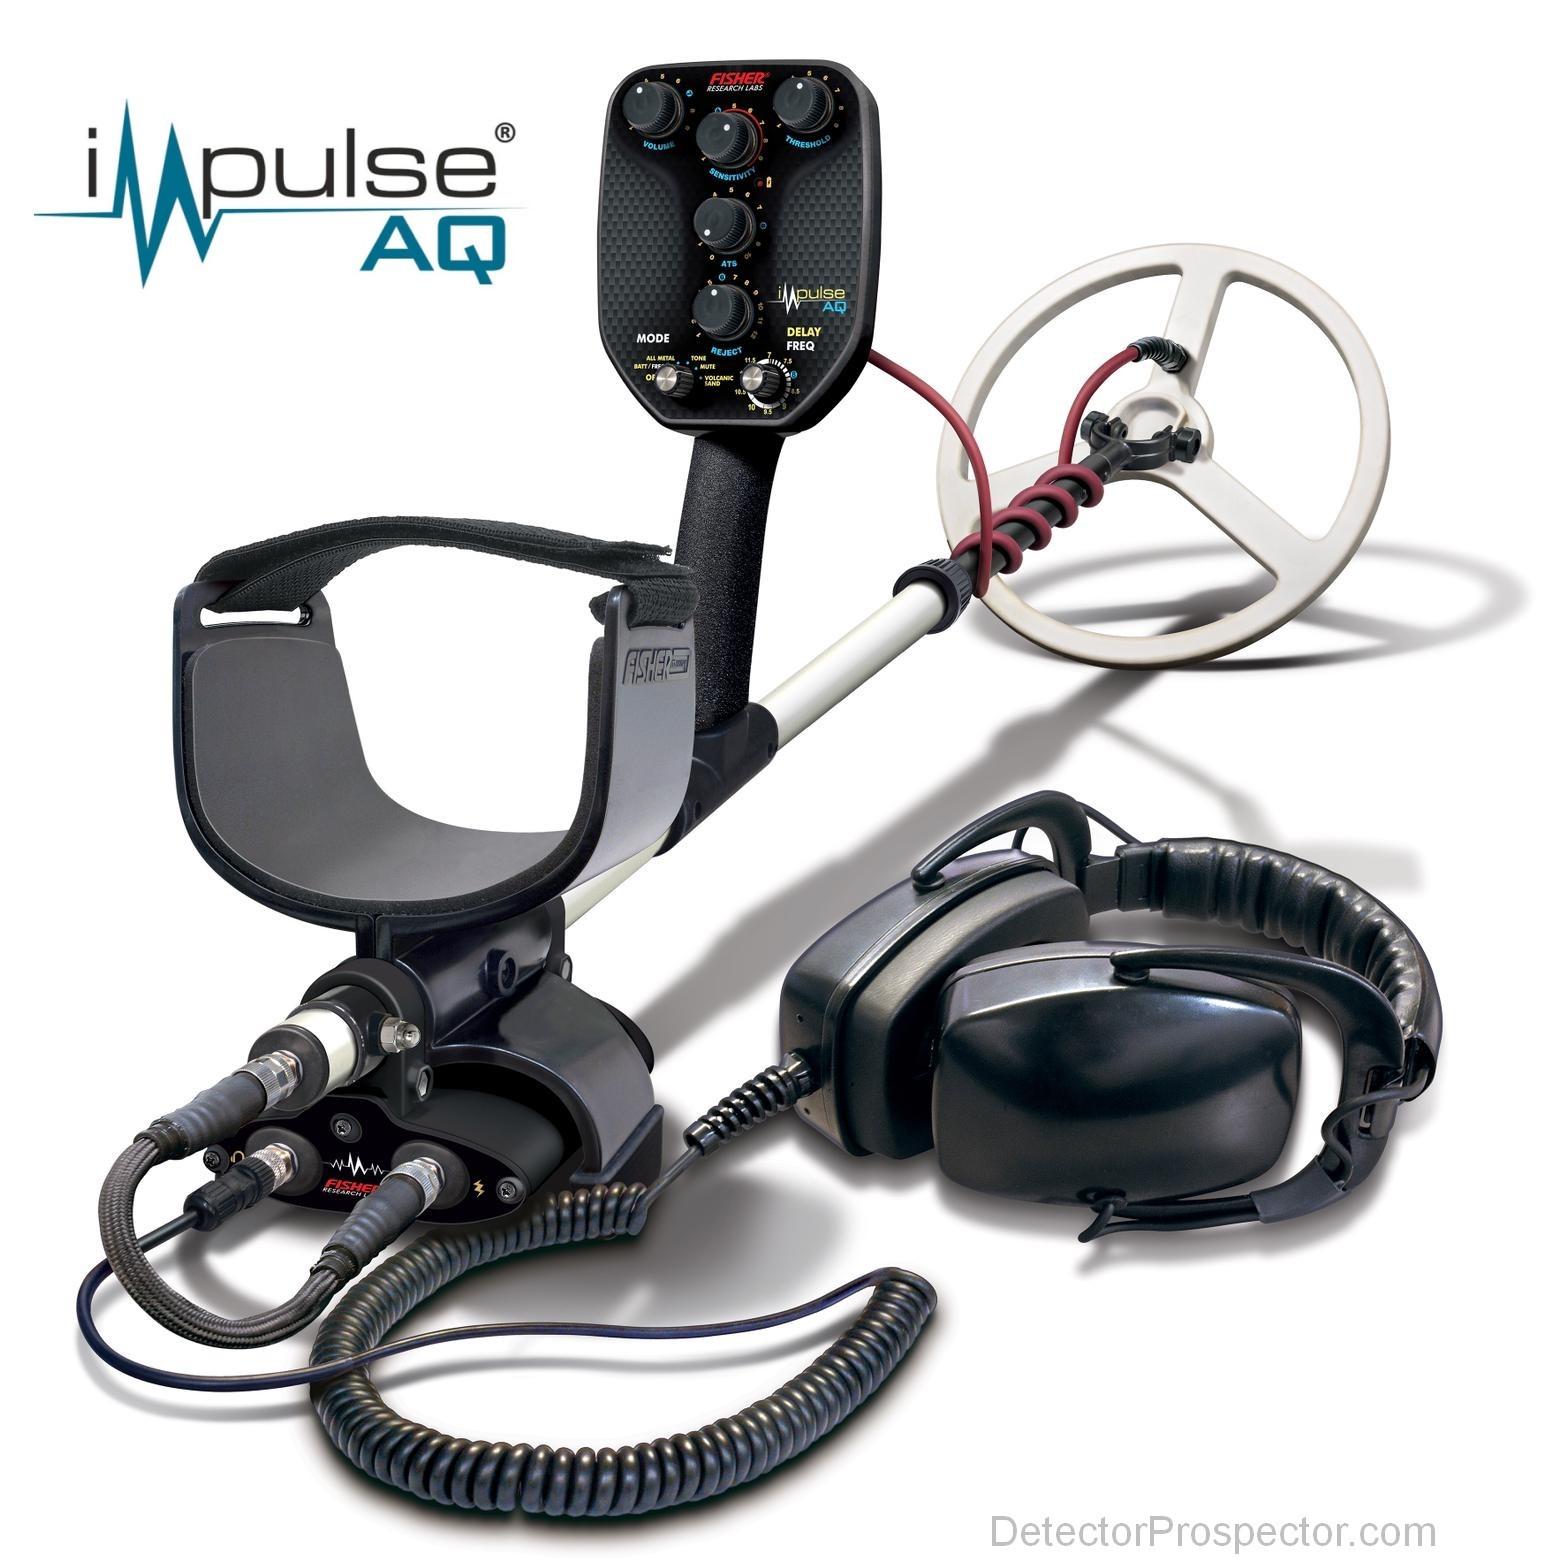 fisher-impulse-aq-discriminating-pulse-induction-jewelry-metal-detector.jpg